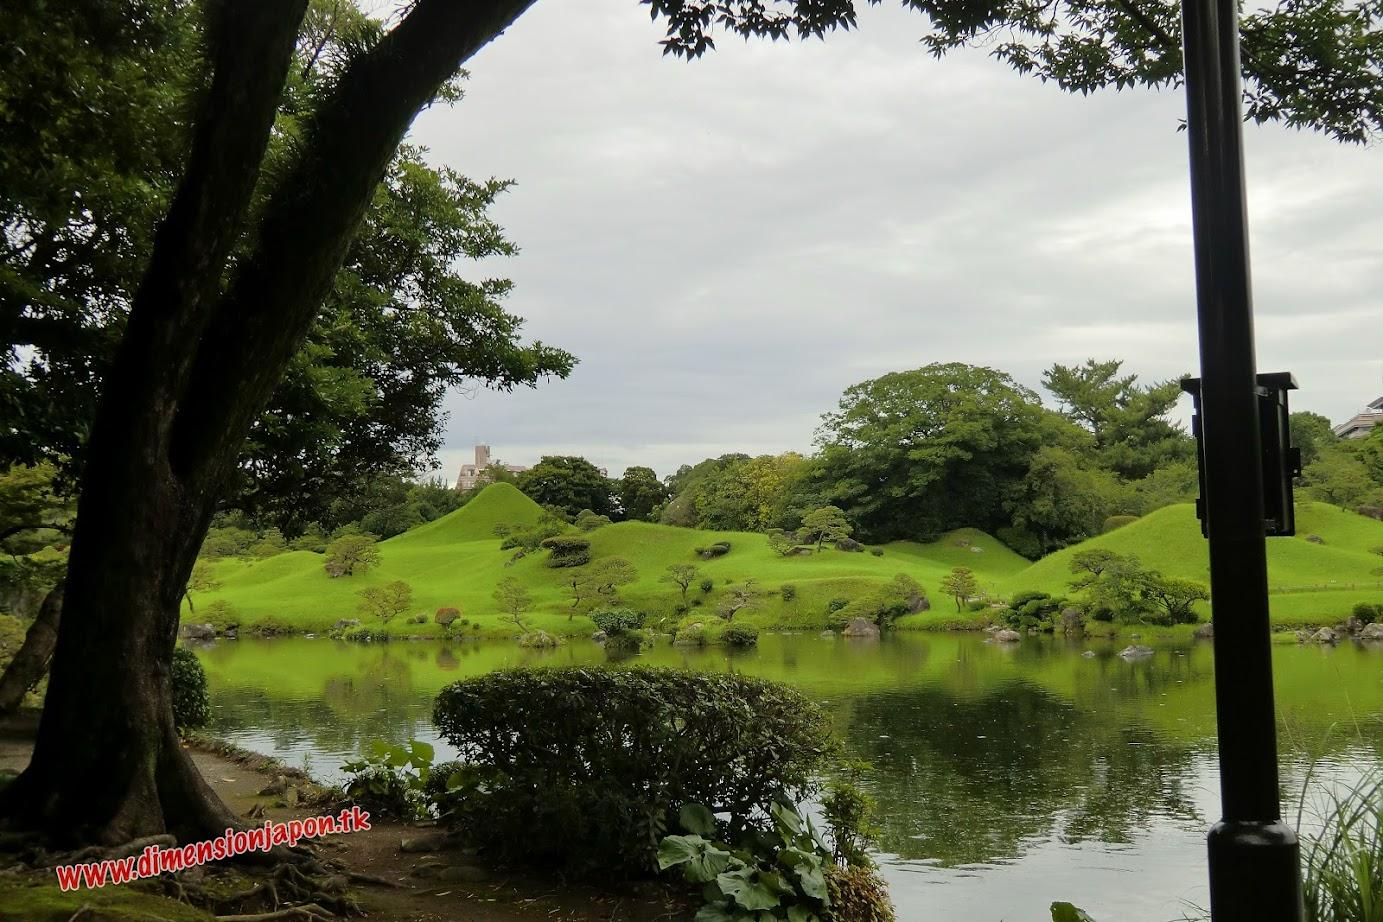 CIMG1536 Jardines Suizenji (Kumamoto) 15-07-2010